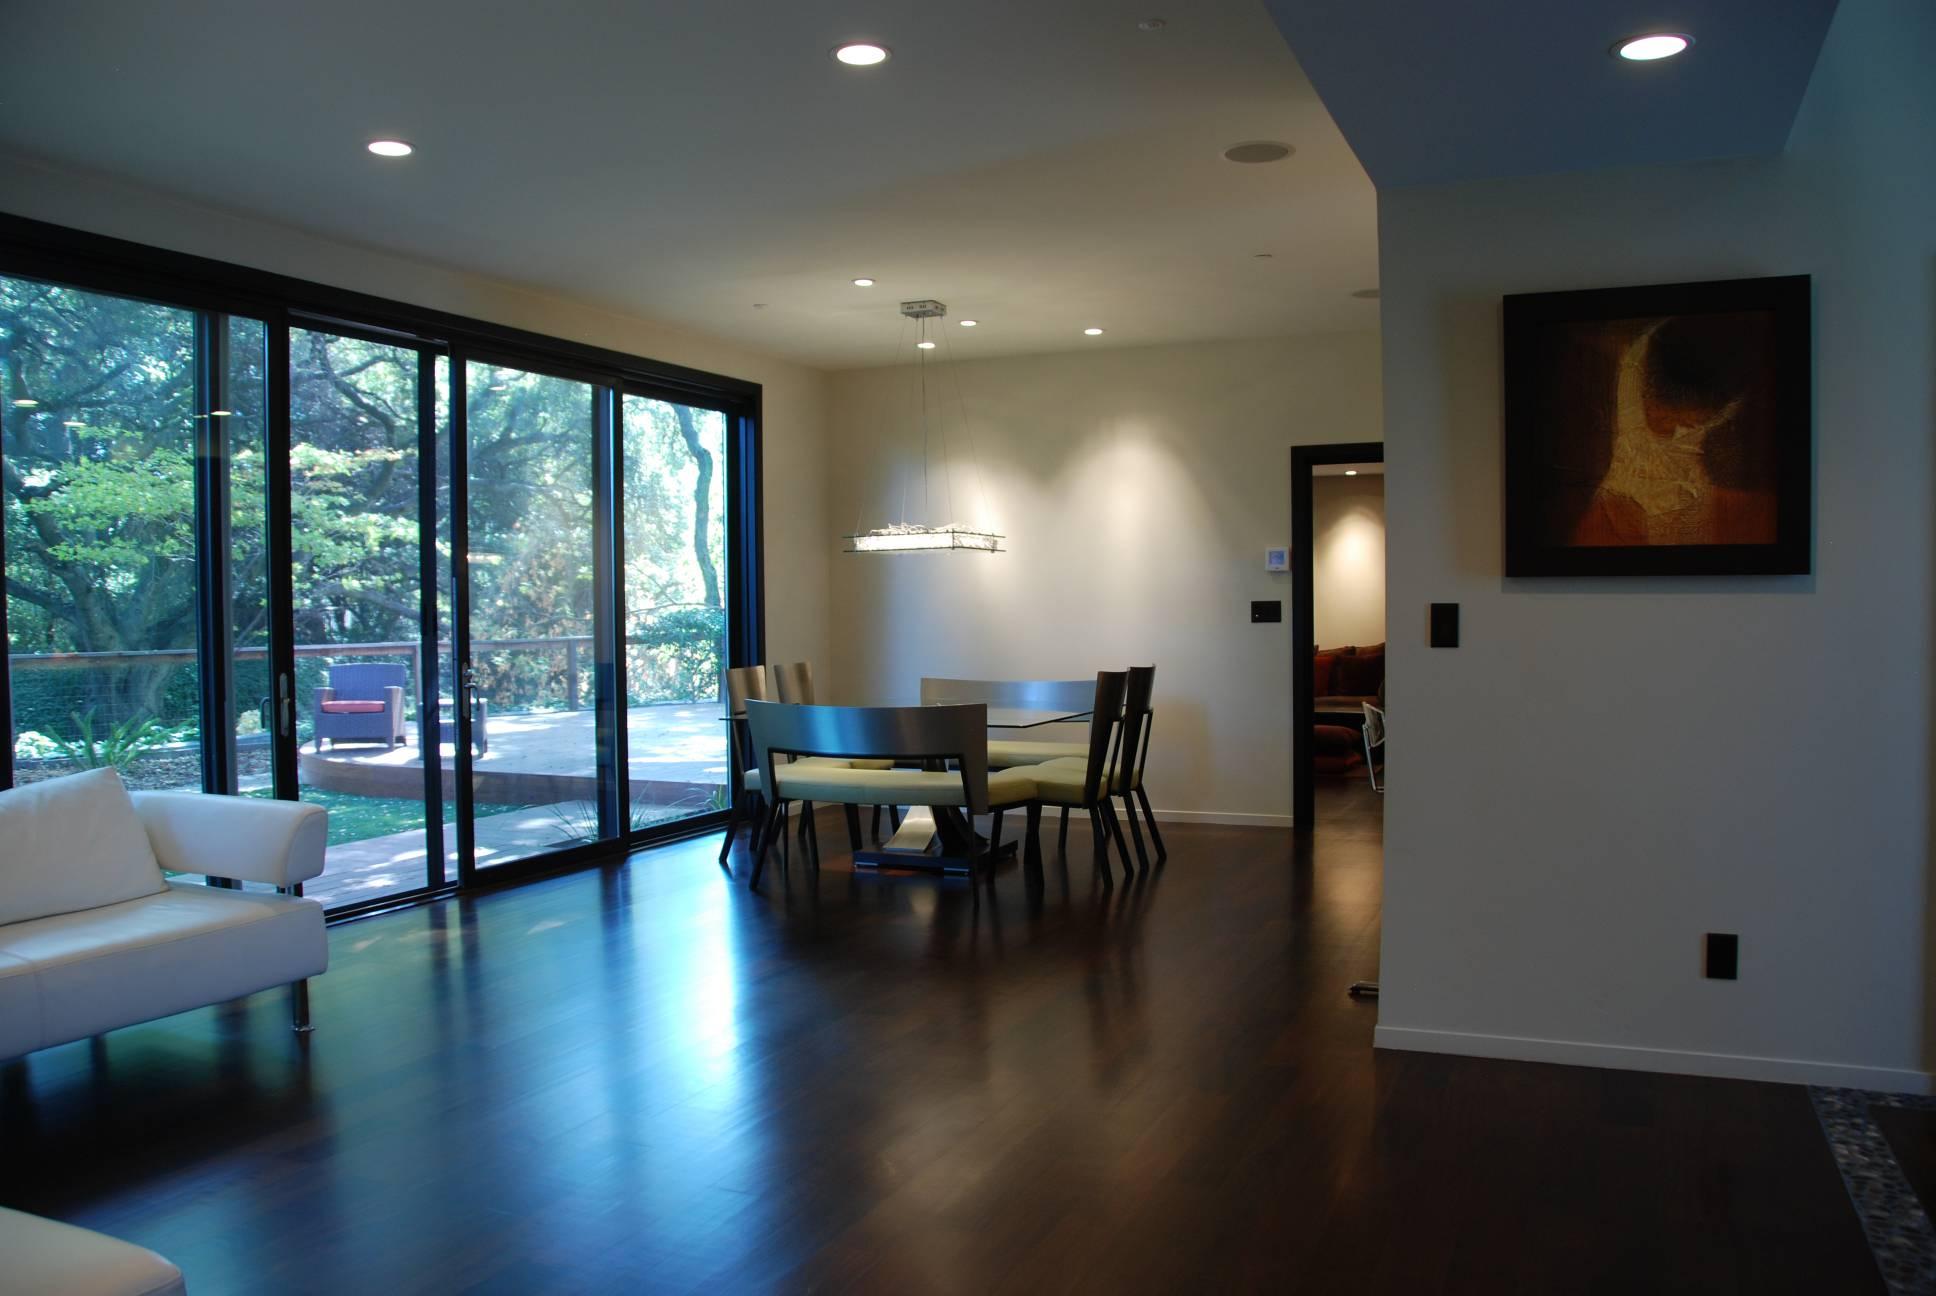 ground-floor-living-area-private-dining, best interior work, architect design, Los Altos